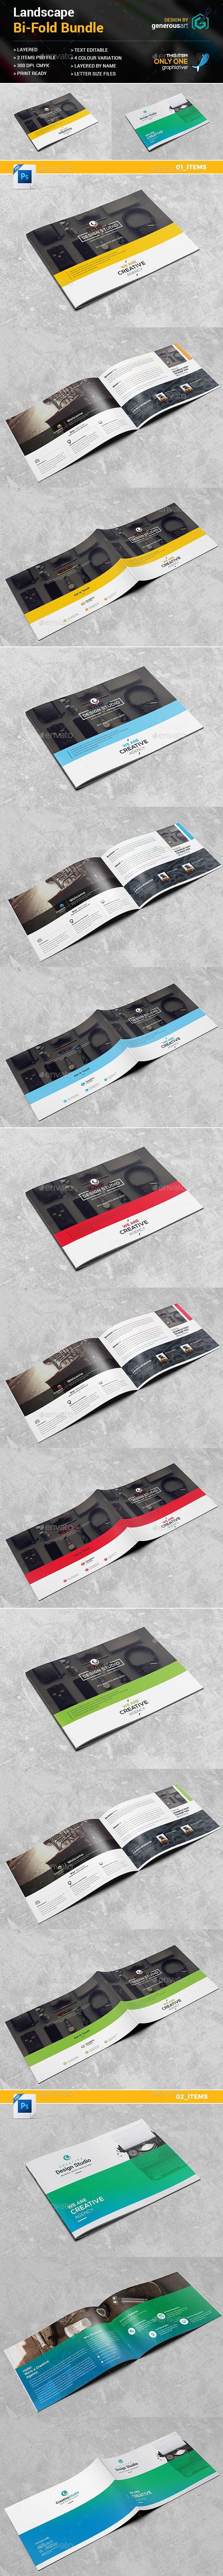 Landscape Bi-Fold Brochure 2 in 1